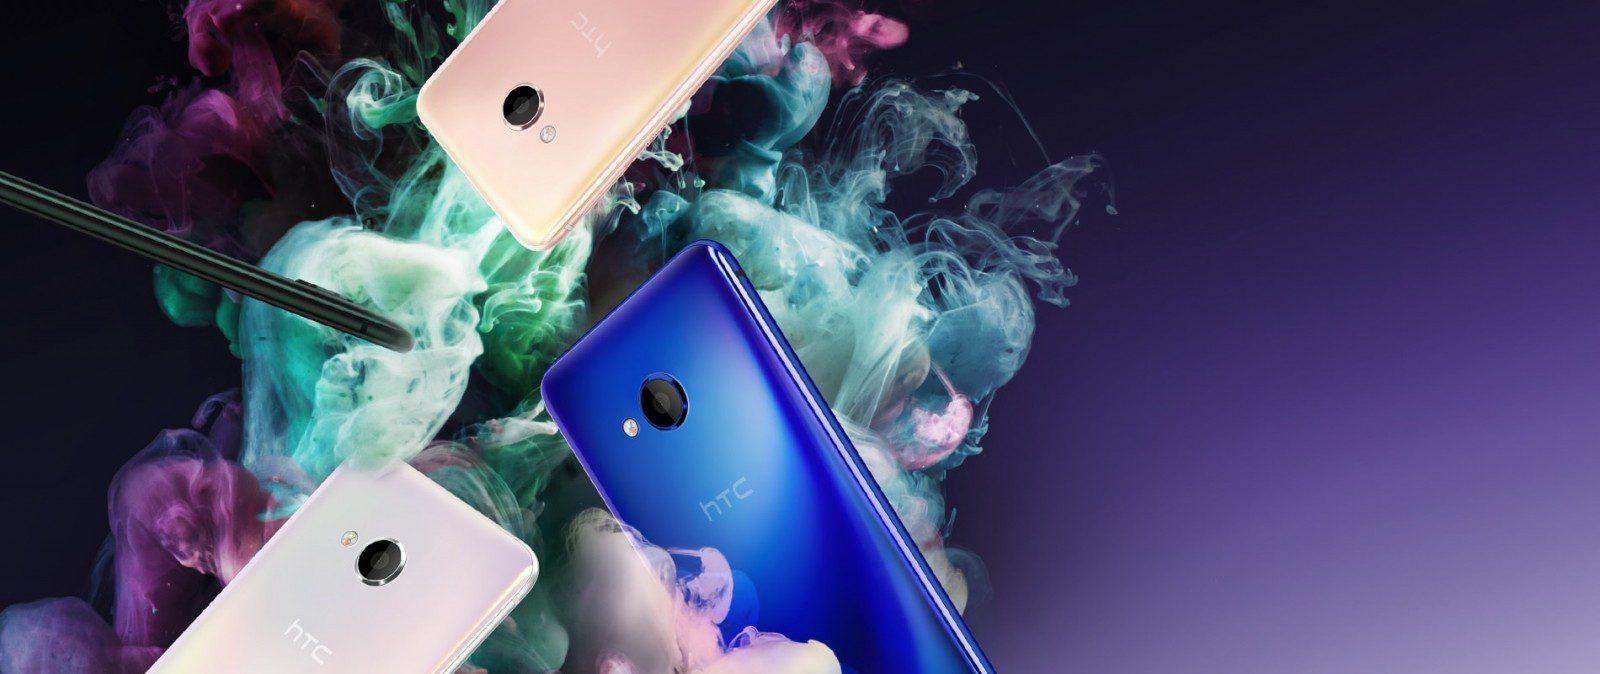 گوشی HTC U Play